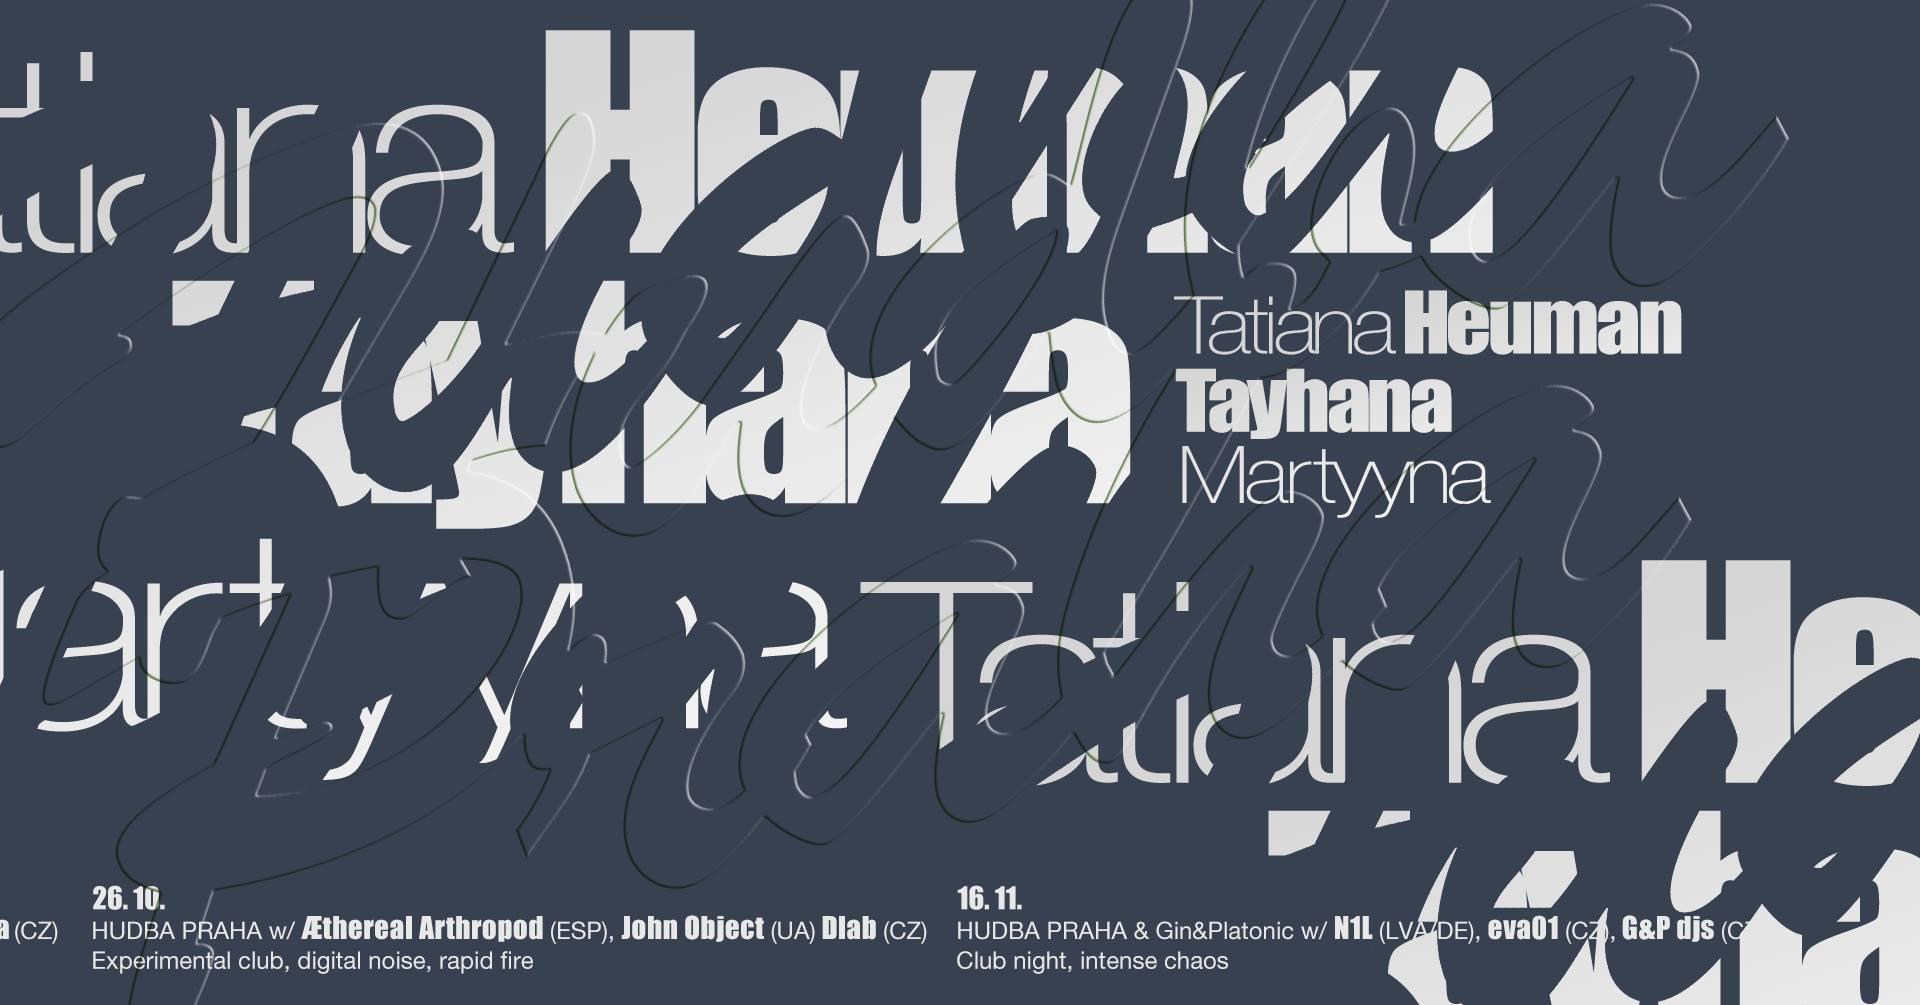 SO / 13.10. / 21.00 / HUDBA PRAHA w/ Tatiana Heuman (AG), Tayhana (AG/MEX) / Martyyna (CZ) / koncert, dj set